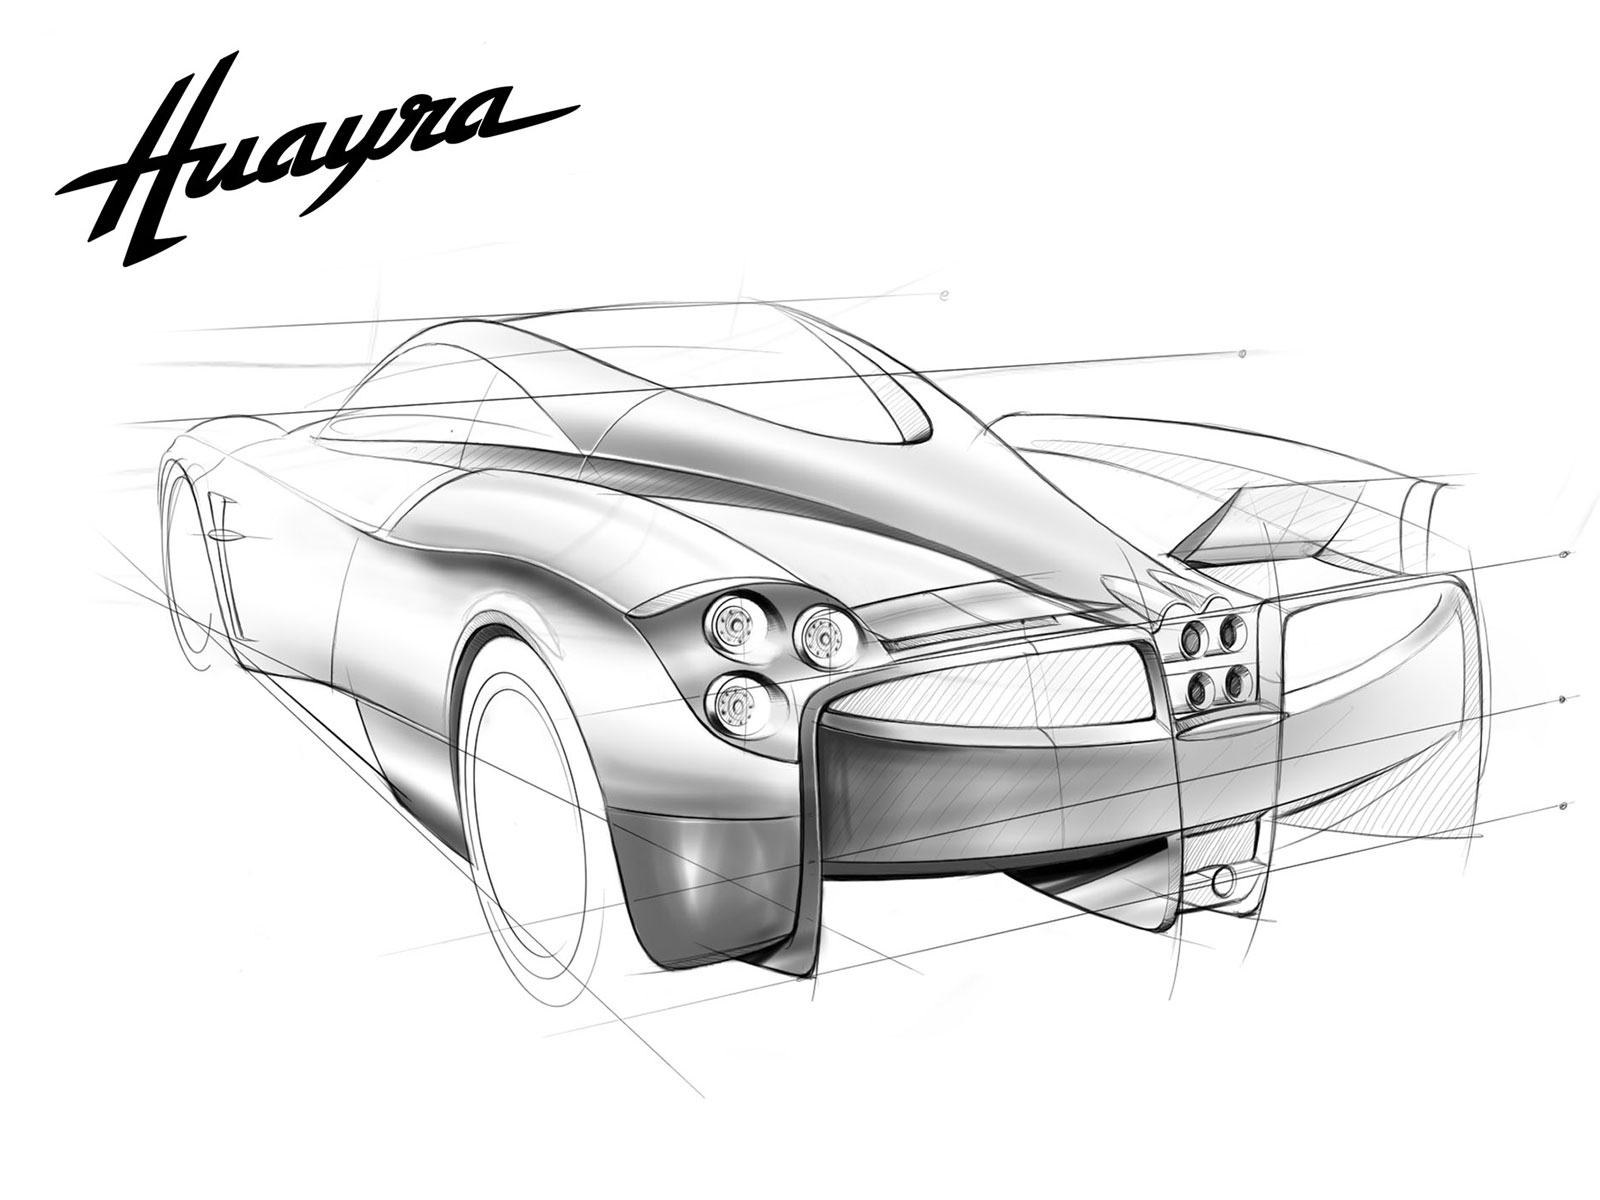 Pagani Huayra Design Sketch - Car Body Design